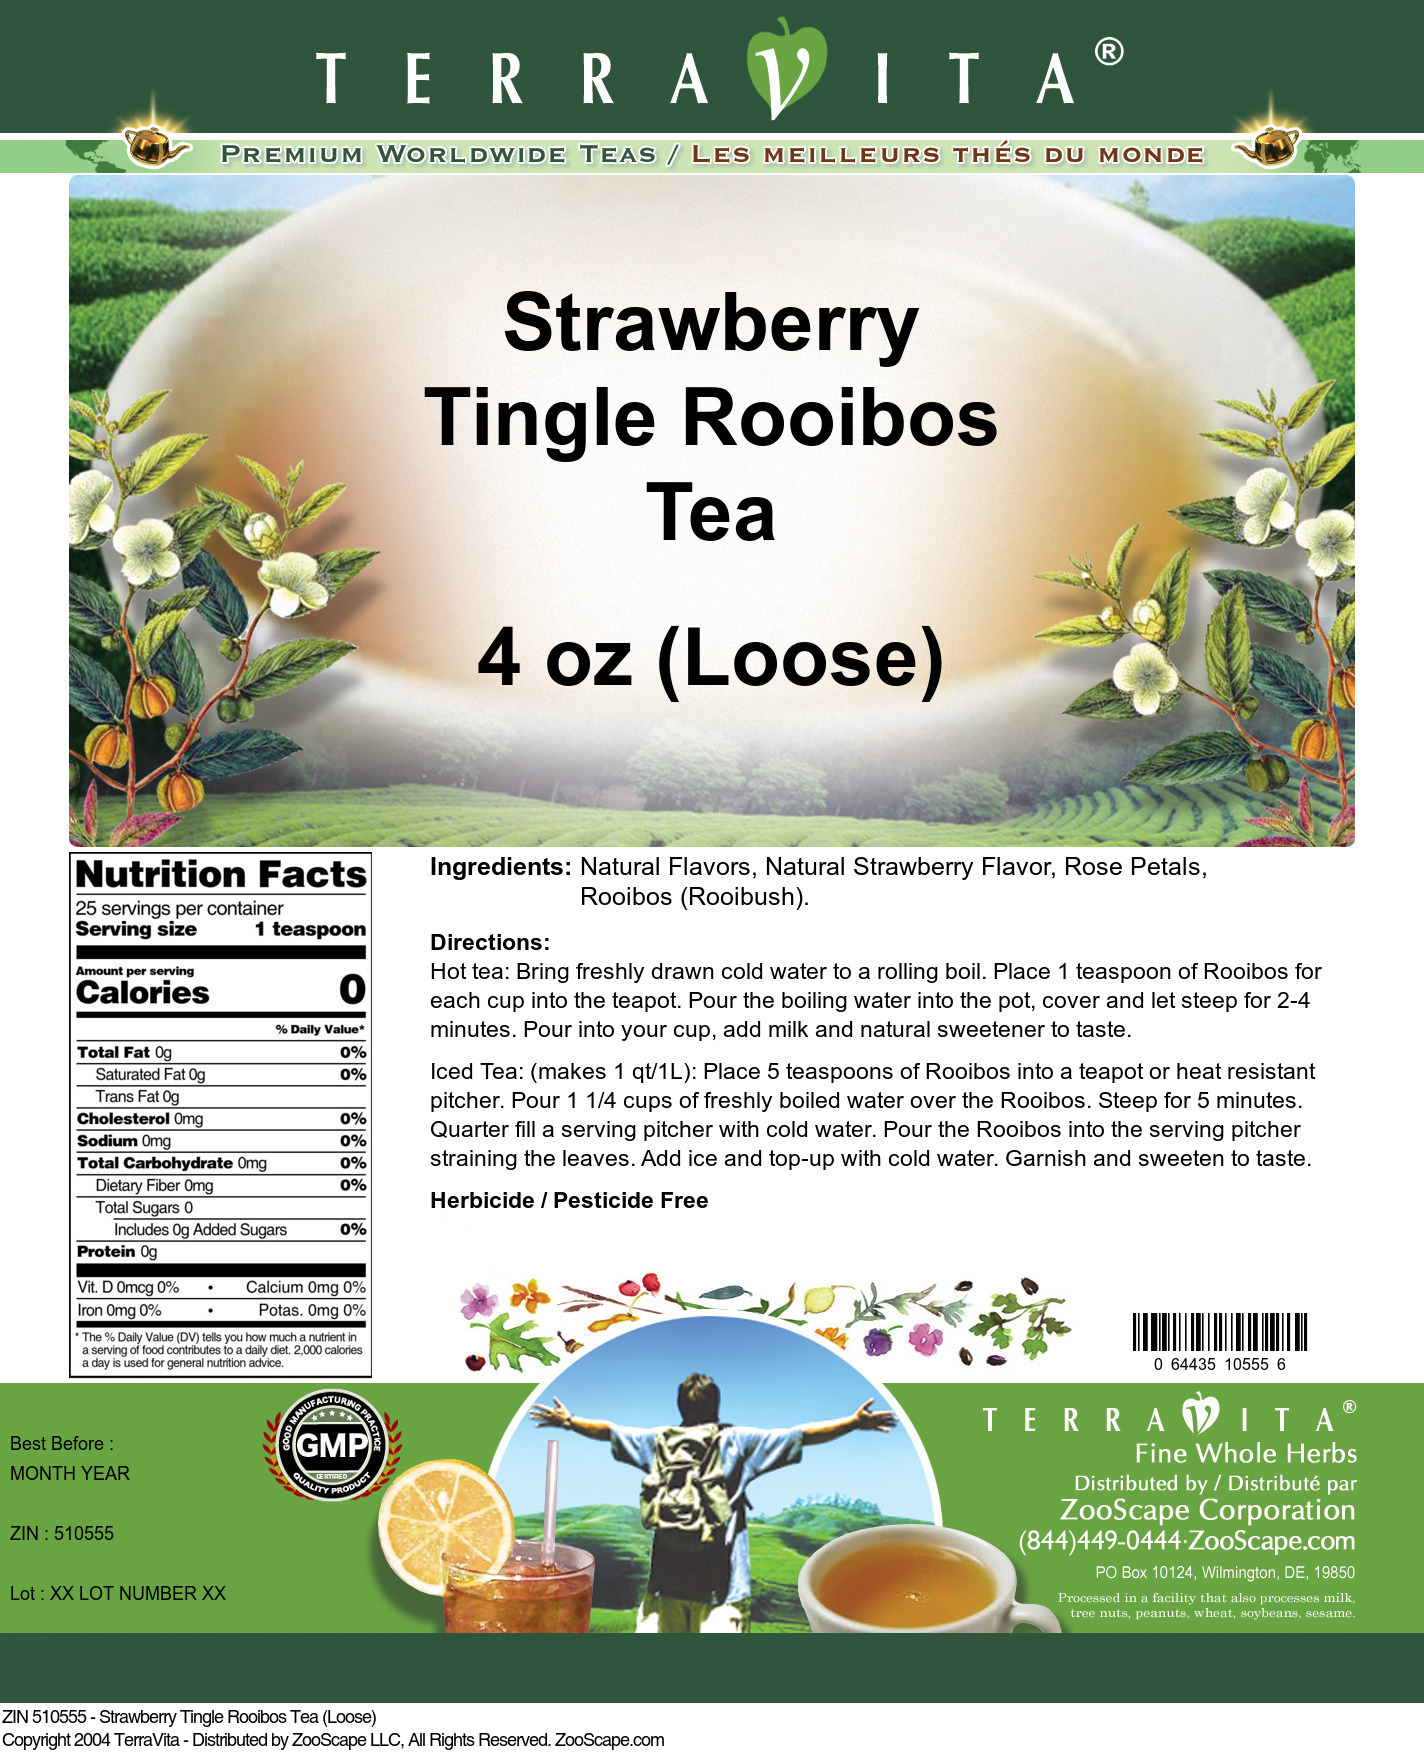 Strawberry Tingle Rooibos Tea (Loose)